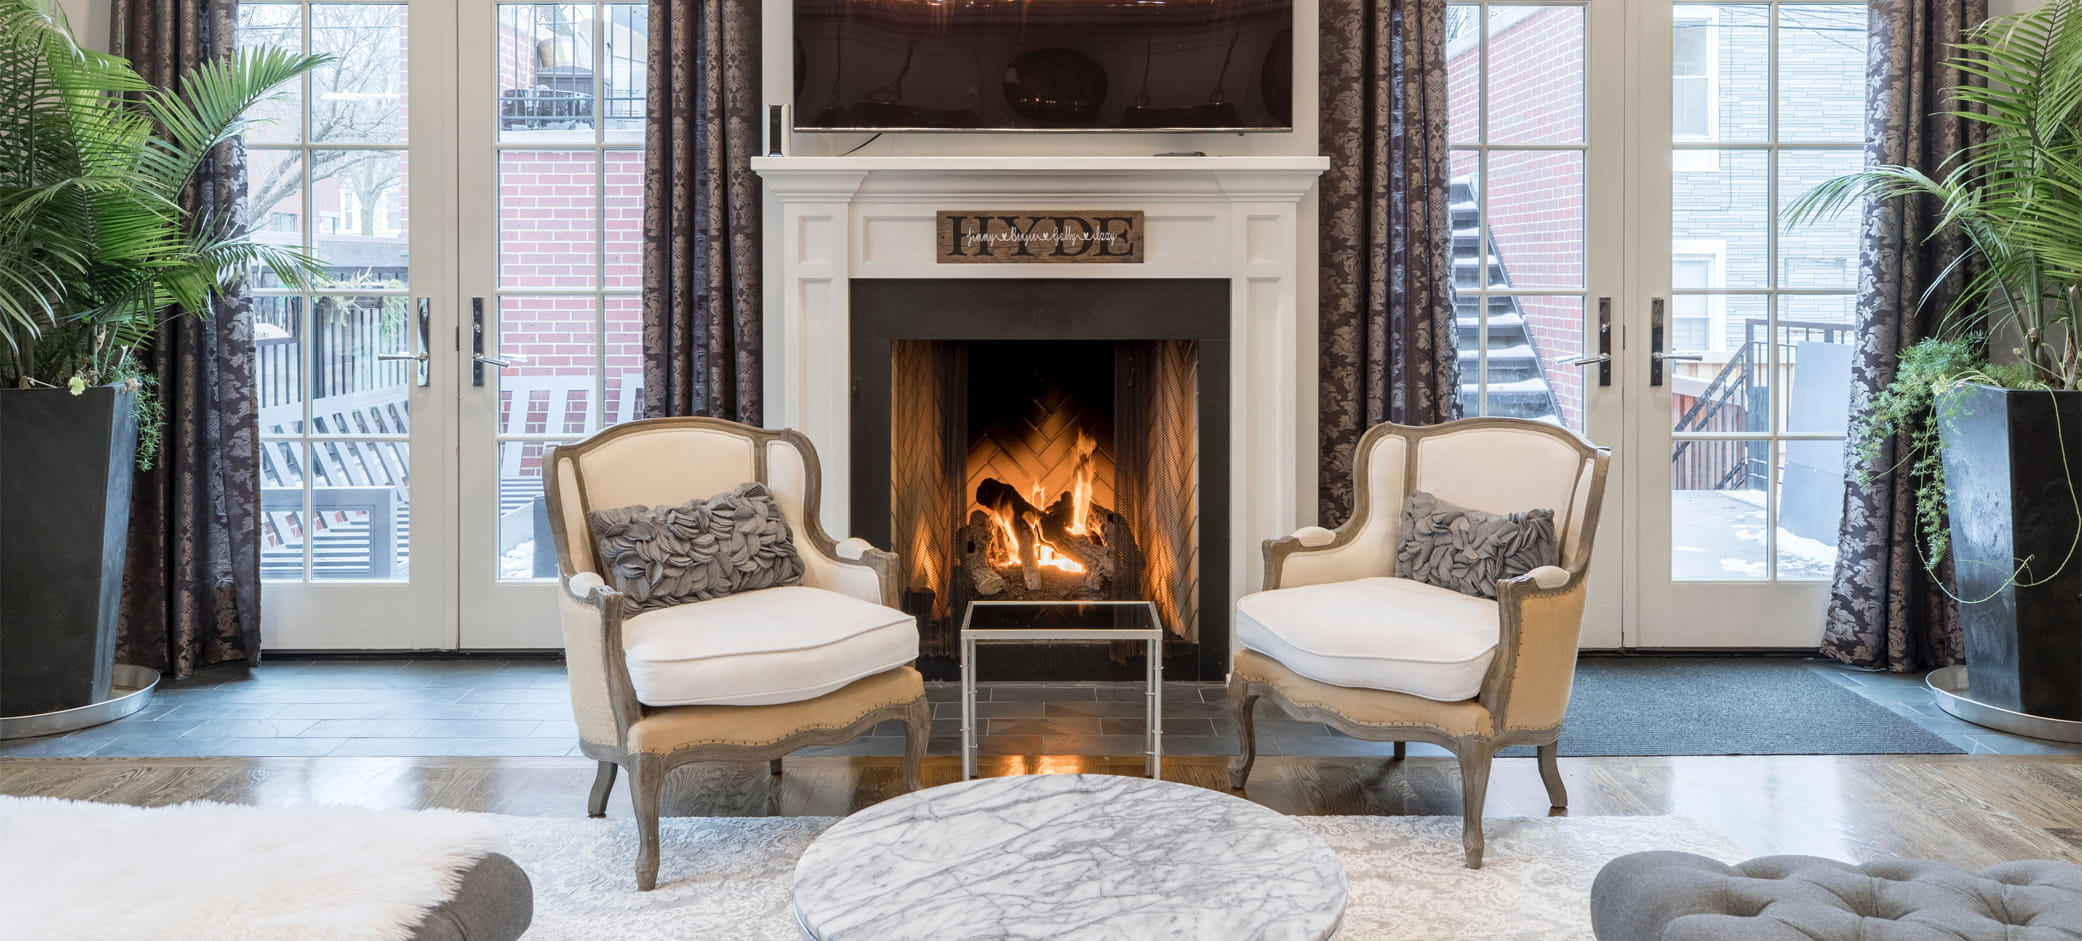 fireplace-banner.jpg